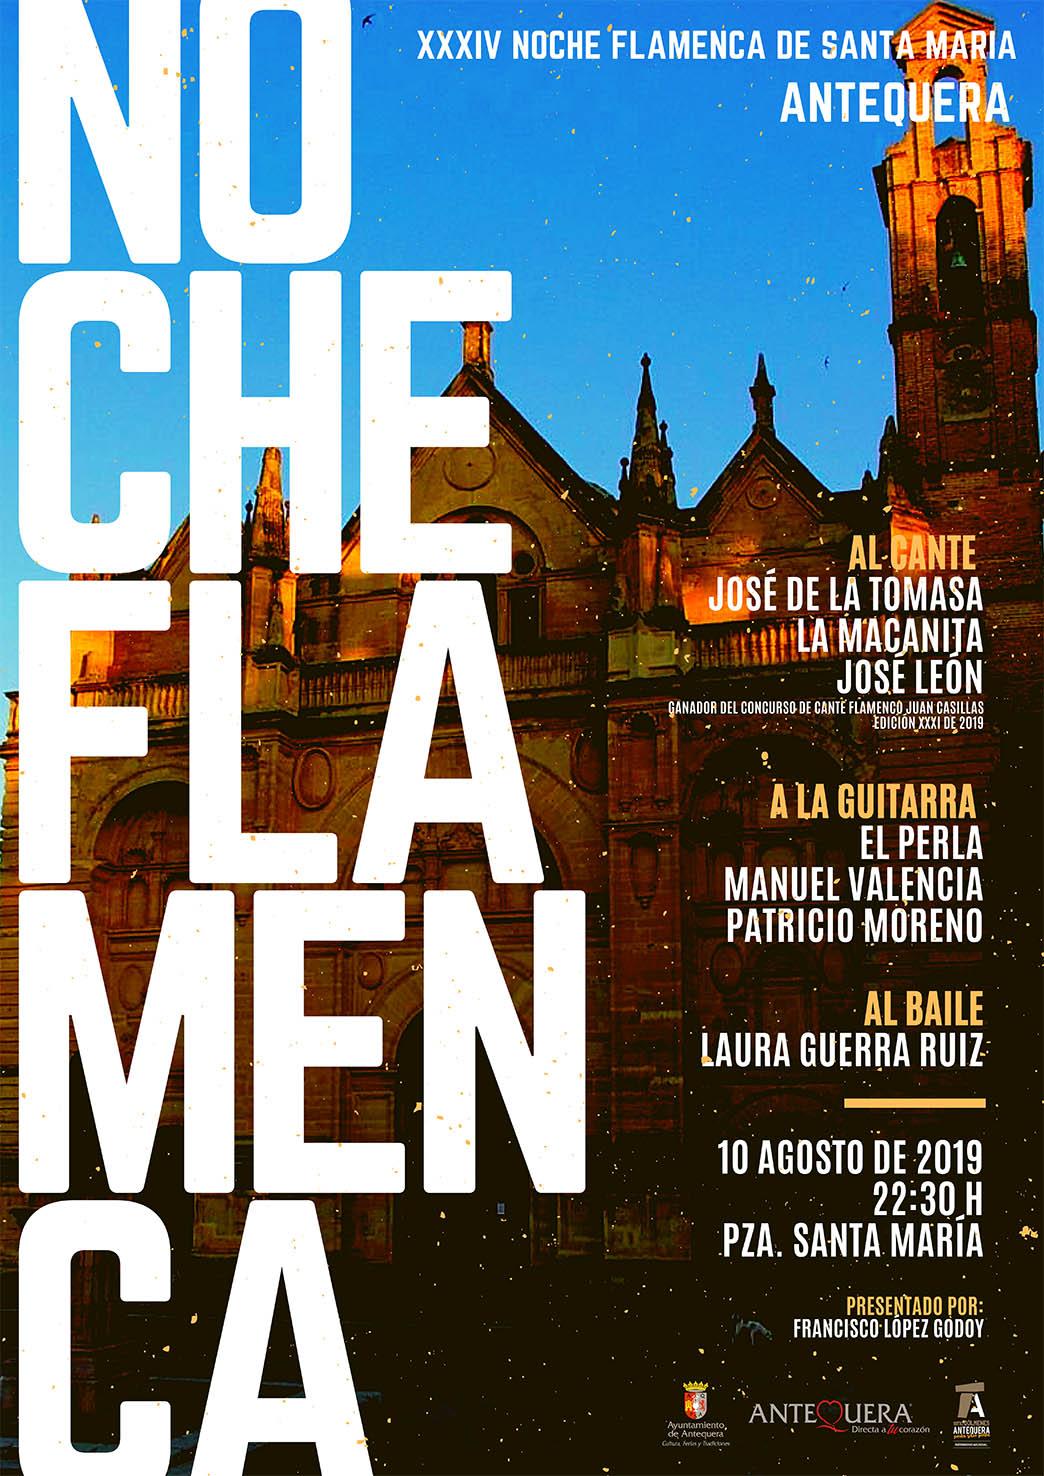 Noche Flamenca Santa María - Antequera